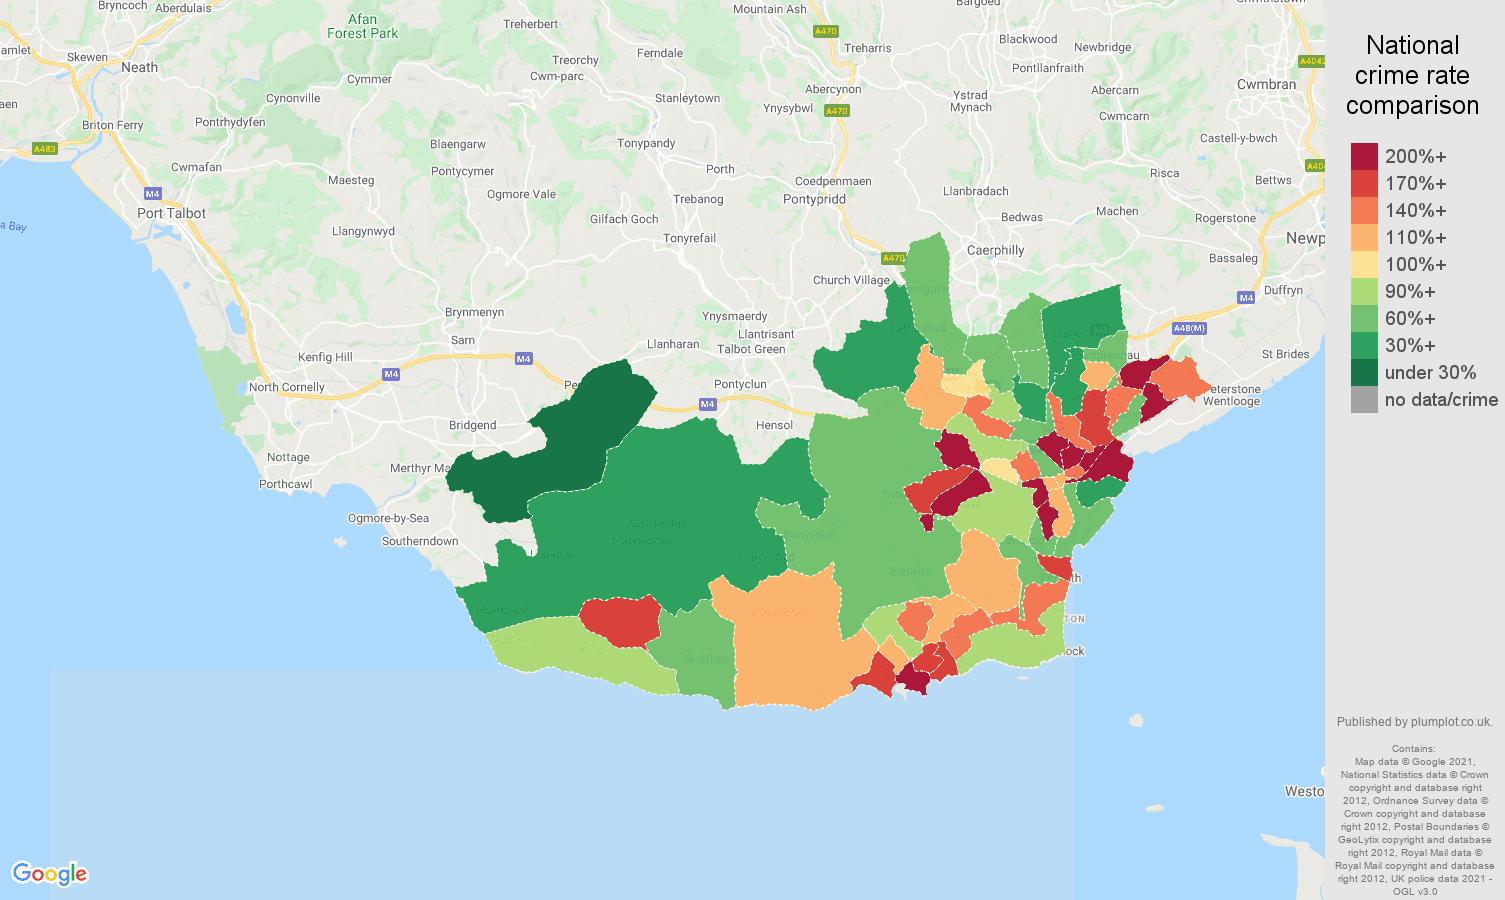 South Glamorgan antisocial behaviour crime rate comparison map